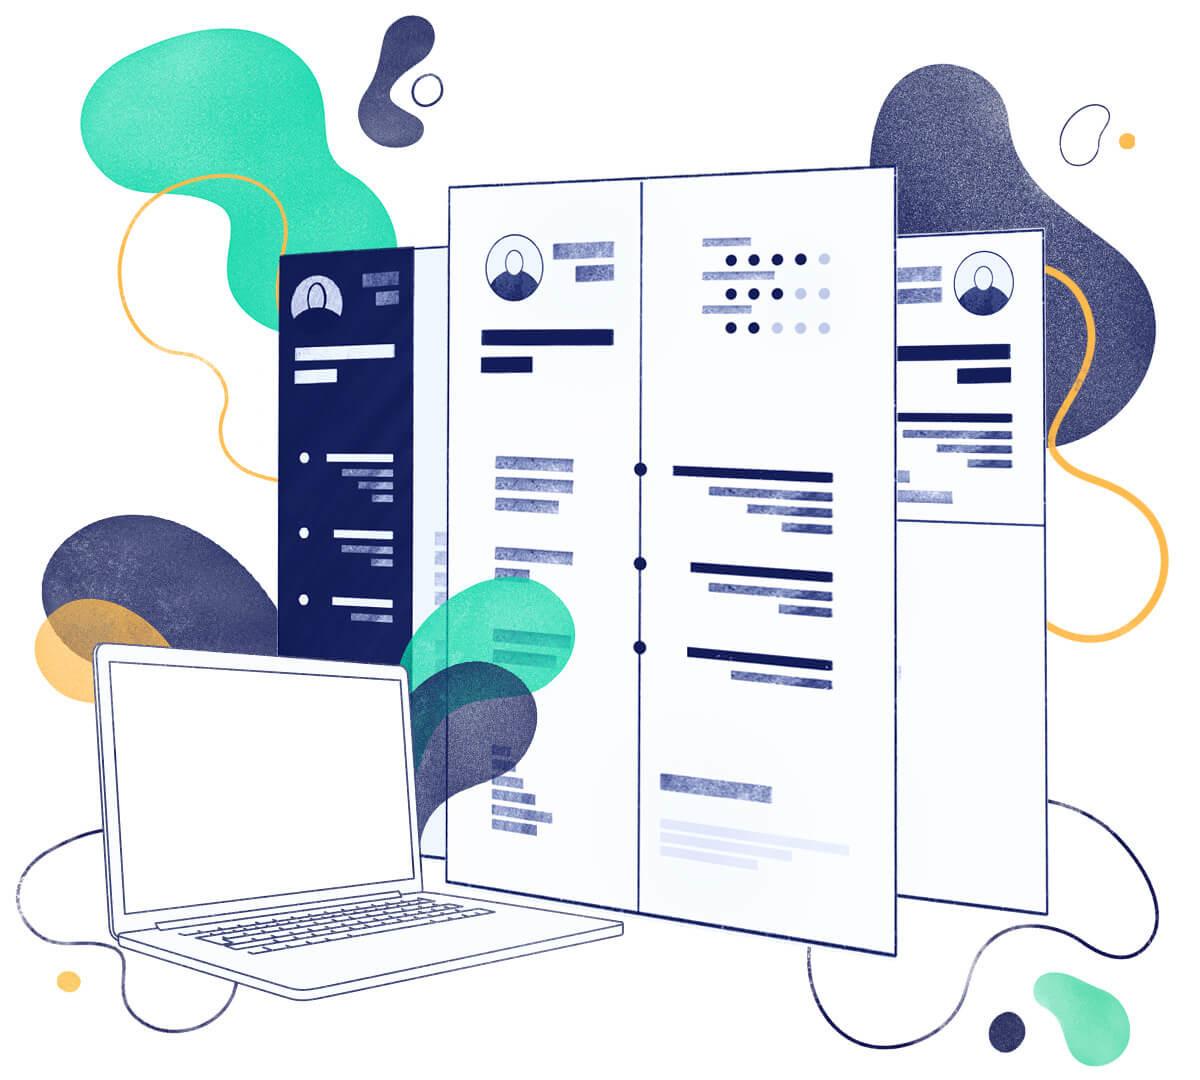 15+ LaTeX CV Templates and CV Templates for 2021